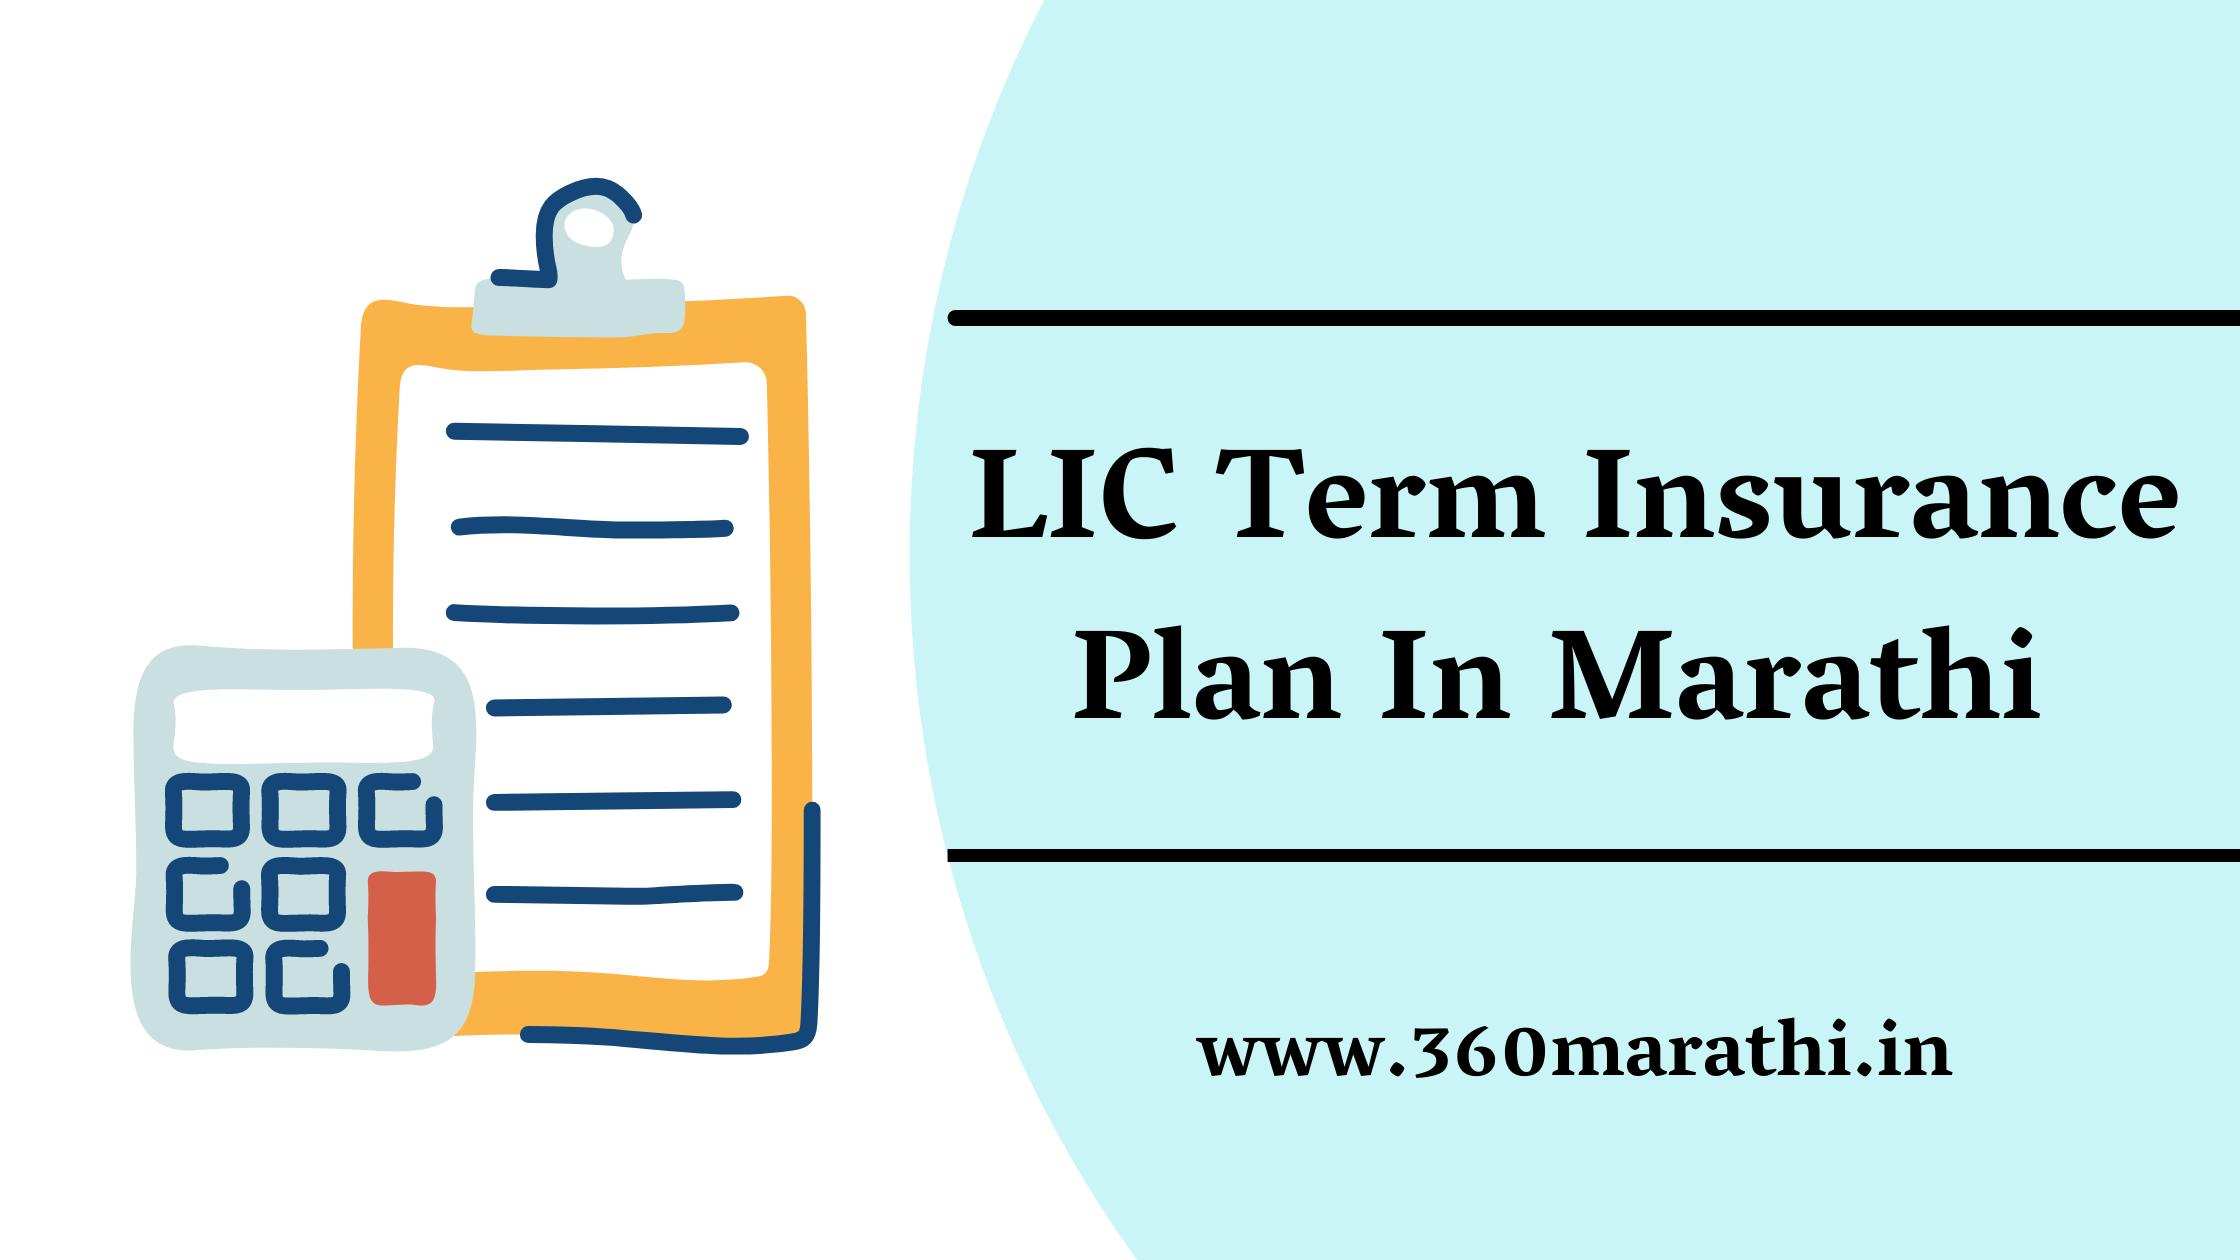 LIC Term Insurance Plan In Marathi | LIC Term Plan Marathi